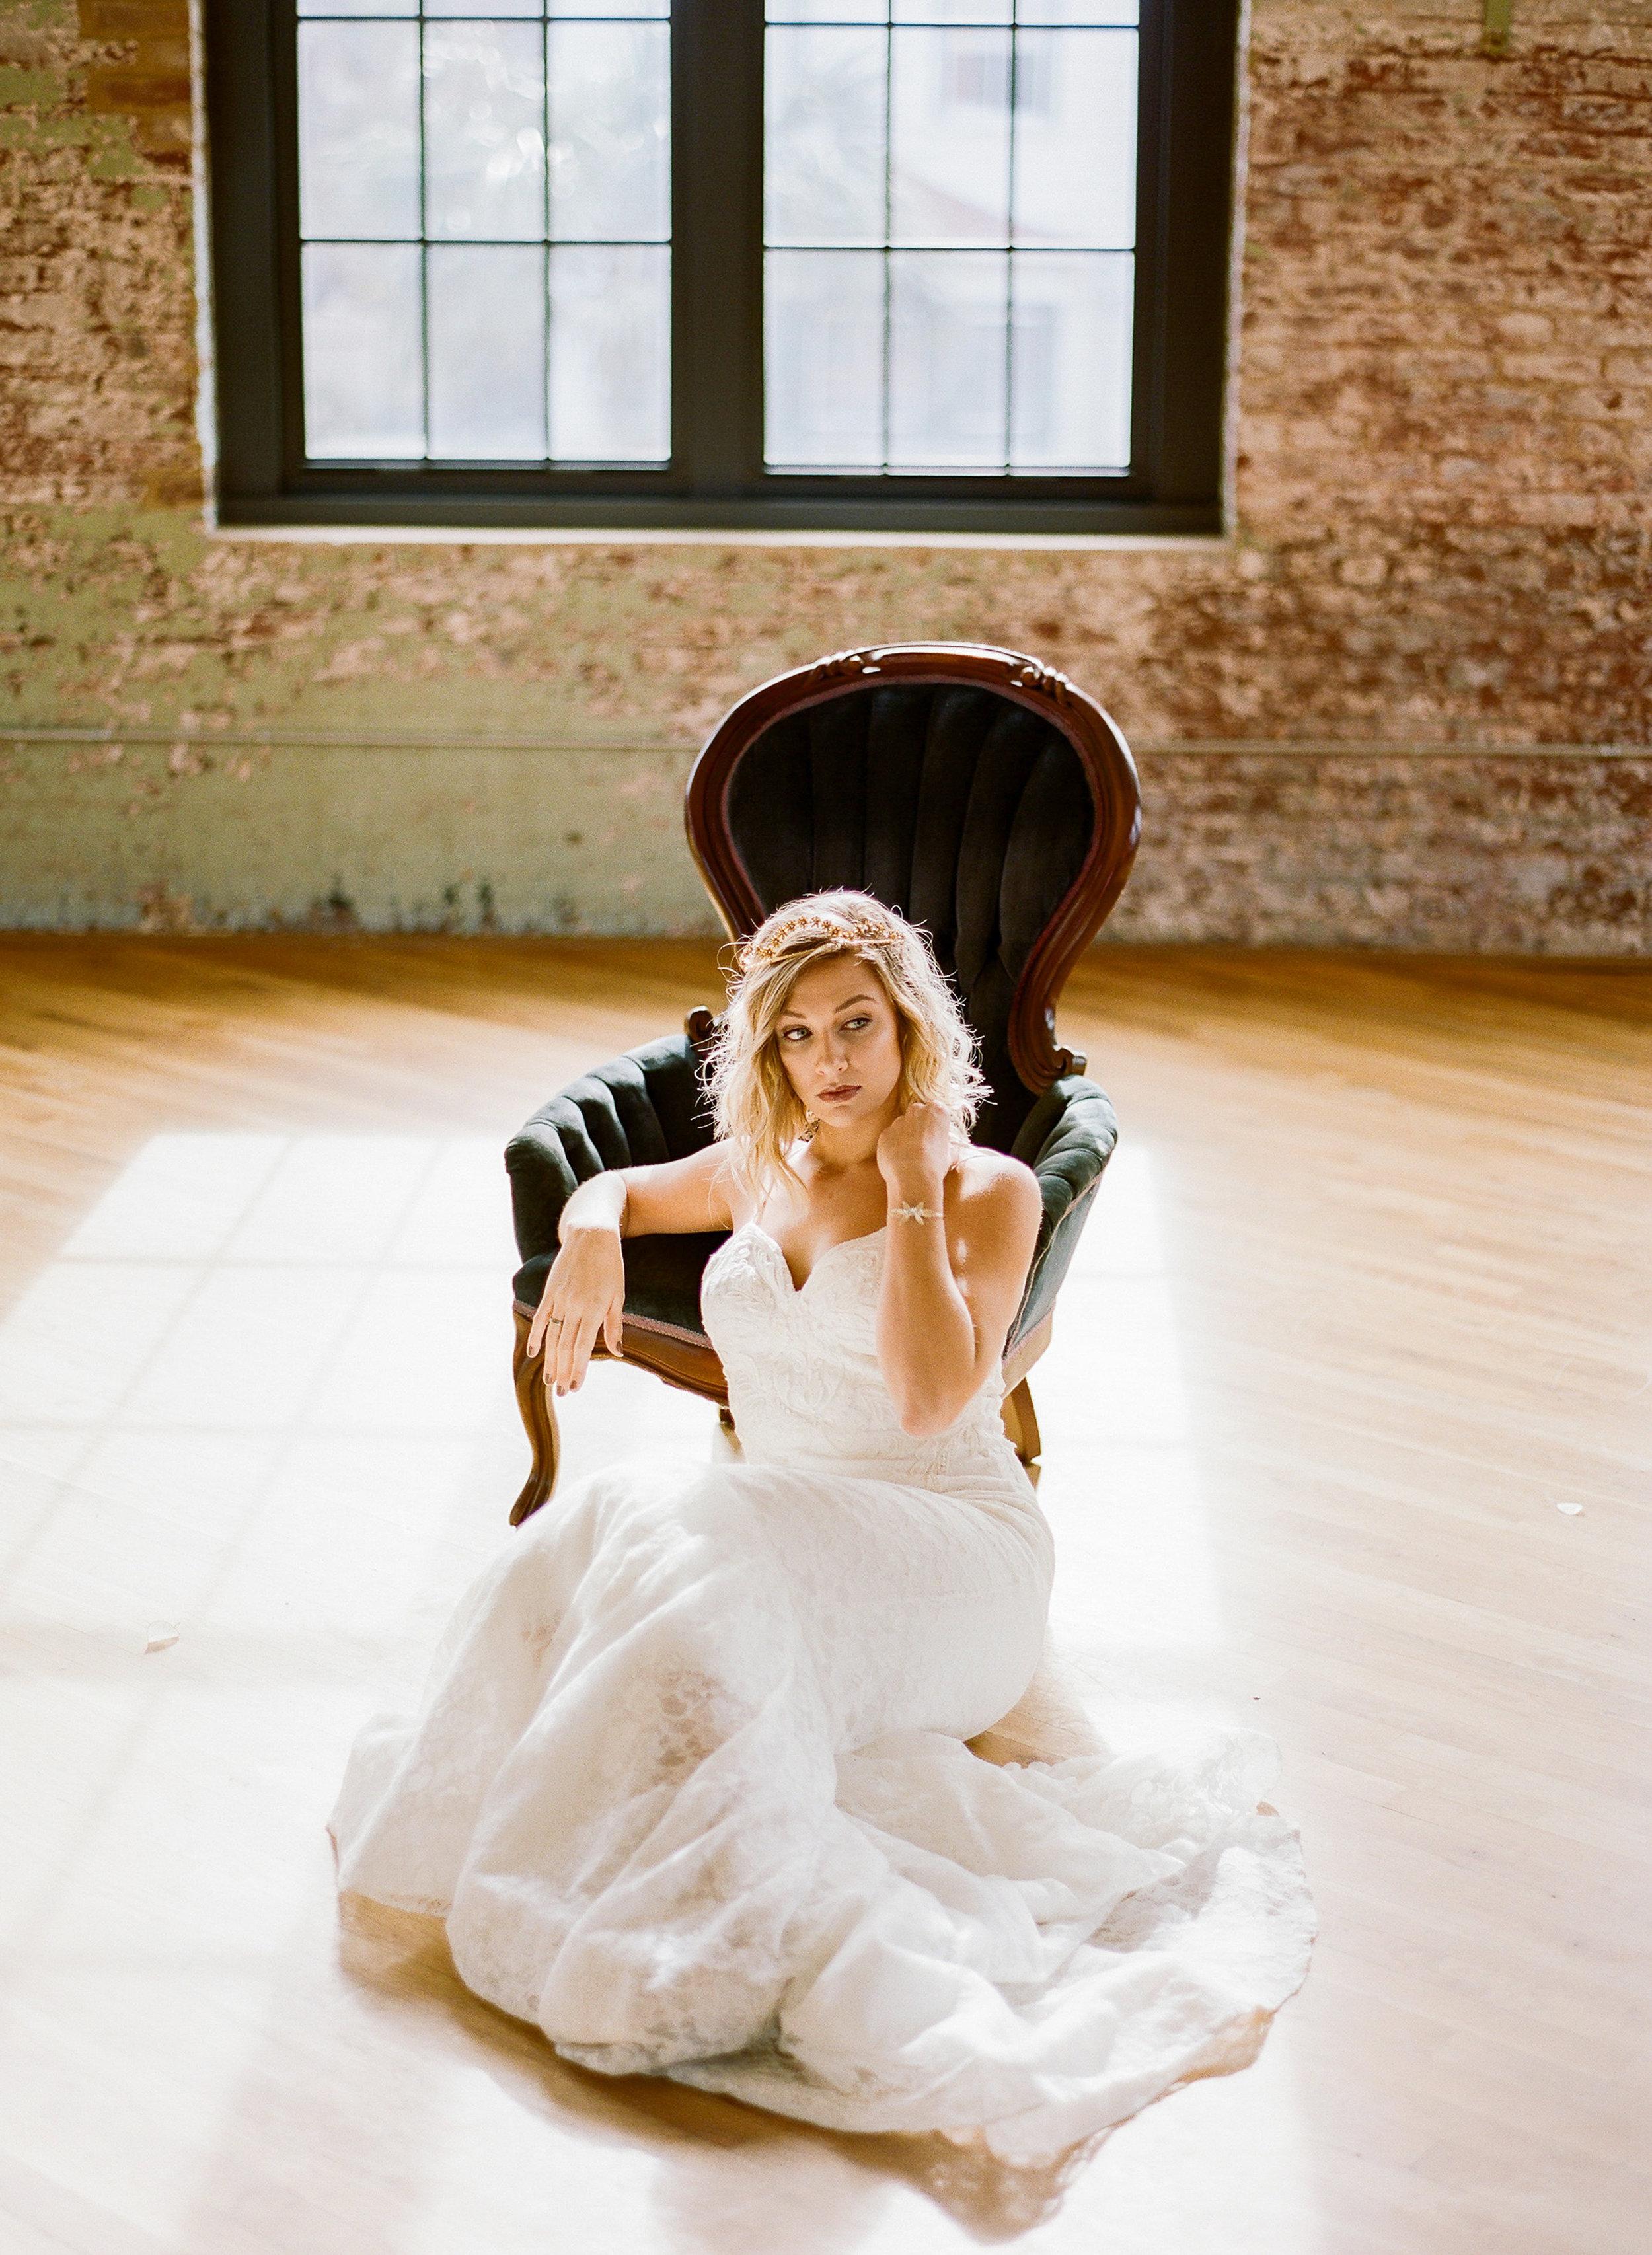 emily-kotarski-bridal-12.jpg